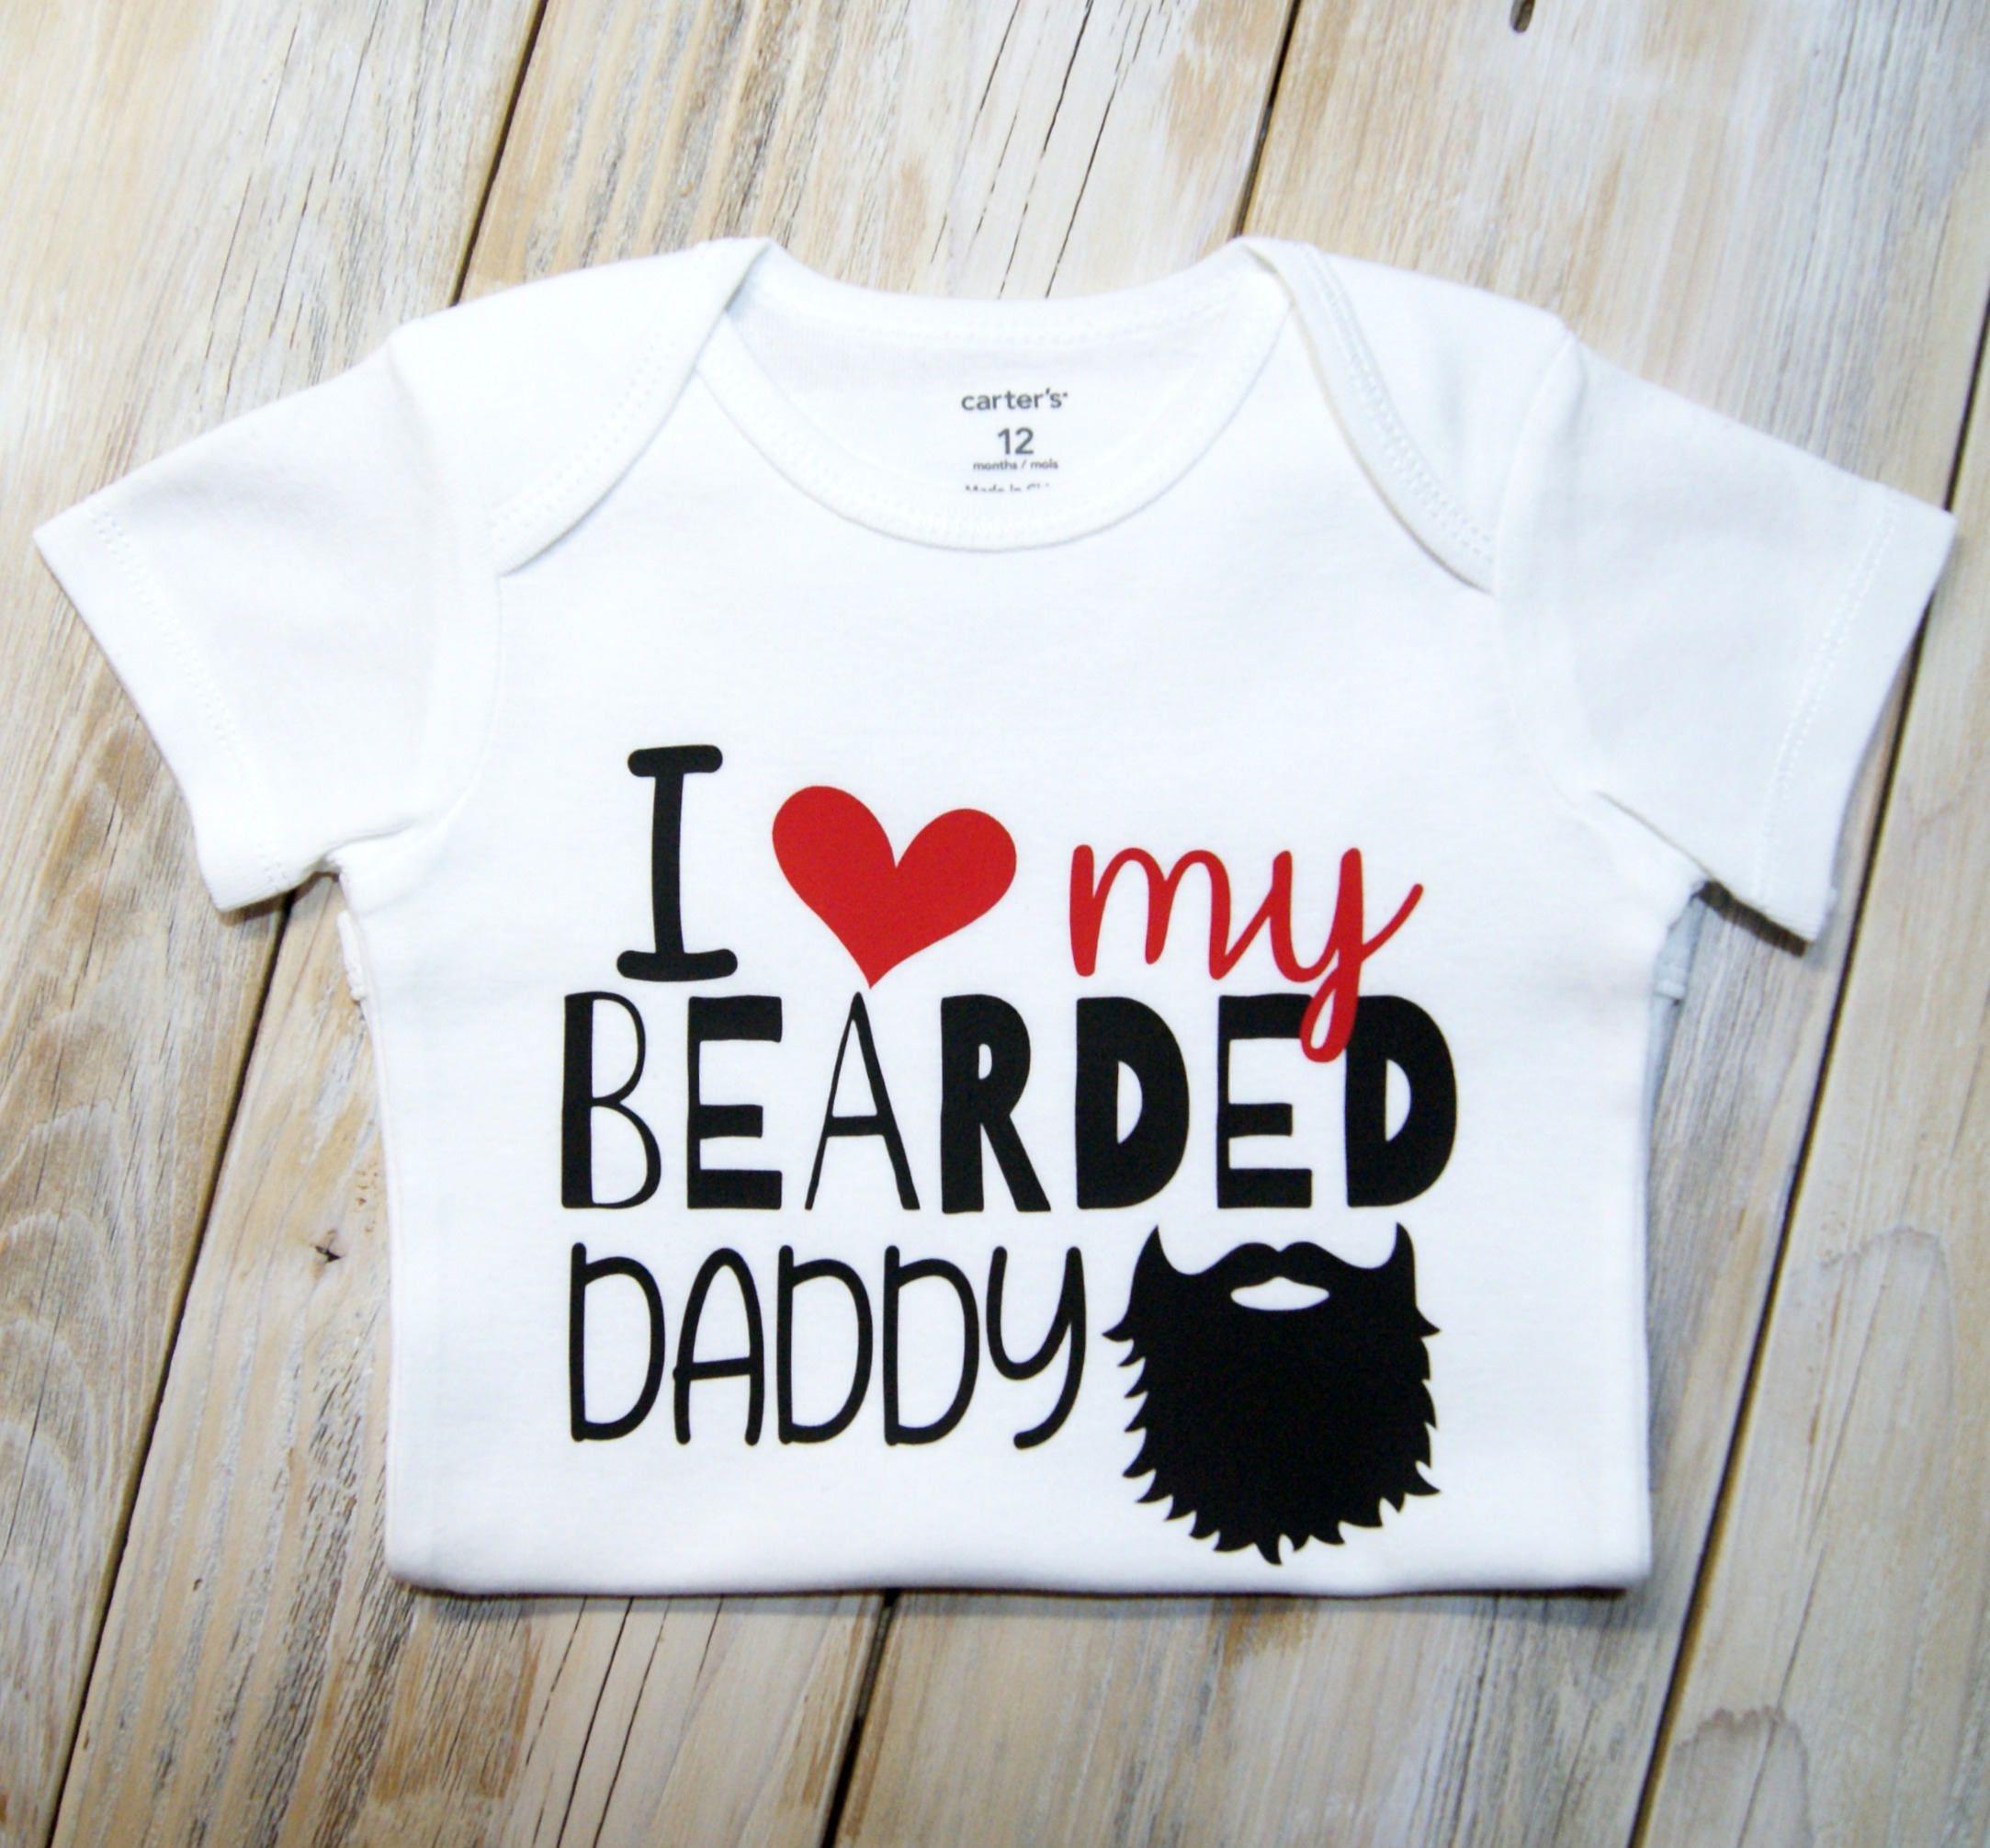 Kids Boys Girls Kiki Do You Love Me T-Shirt